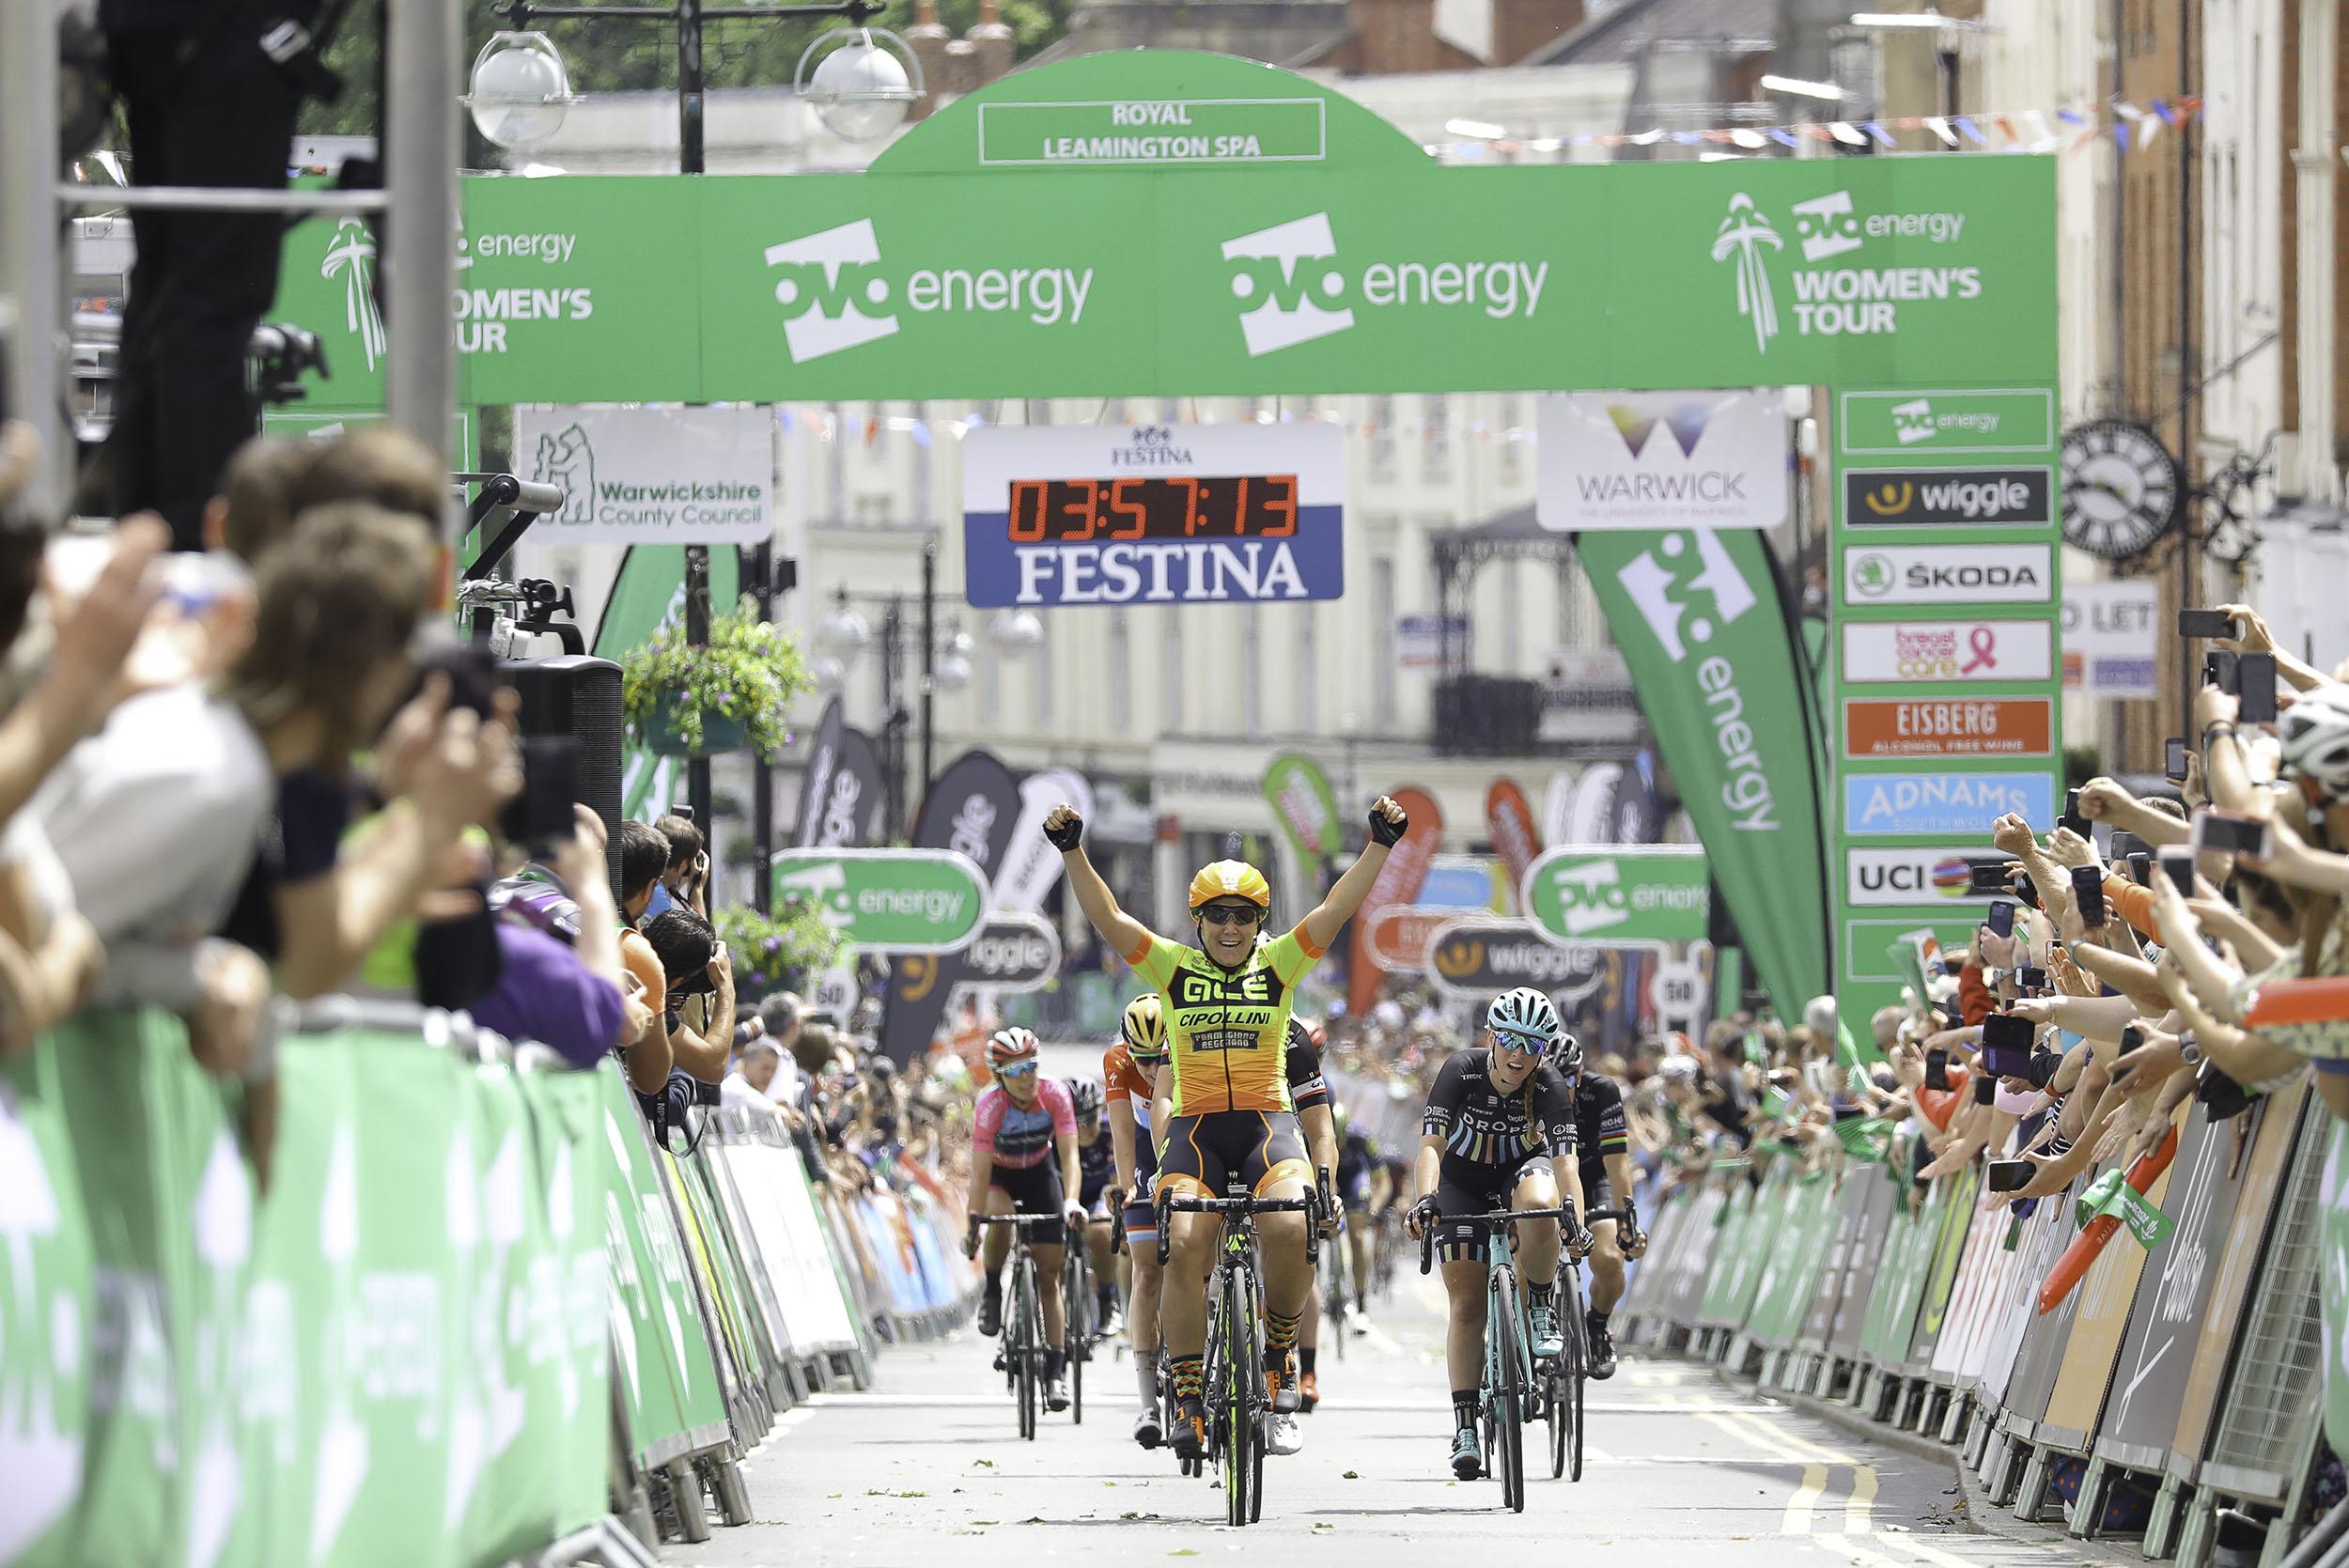 Chloe Hosking wins in Royal Leamington Spa_womens cycling.jpg